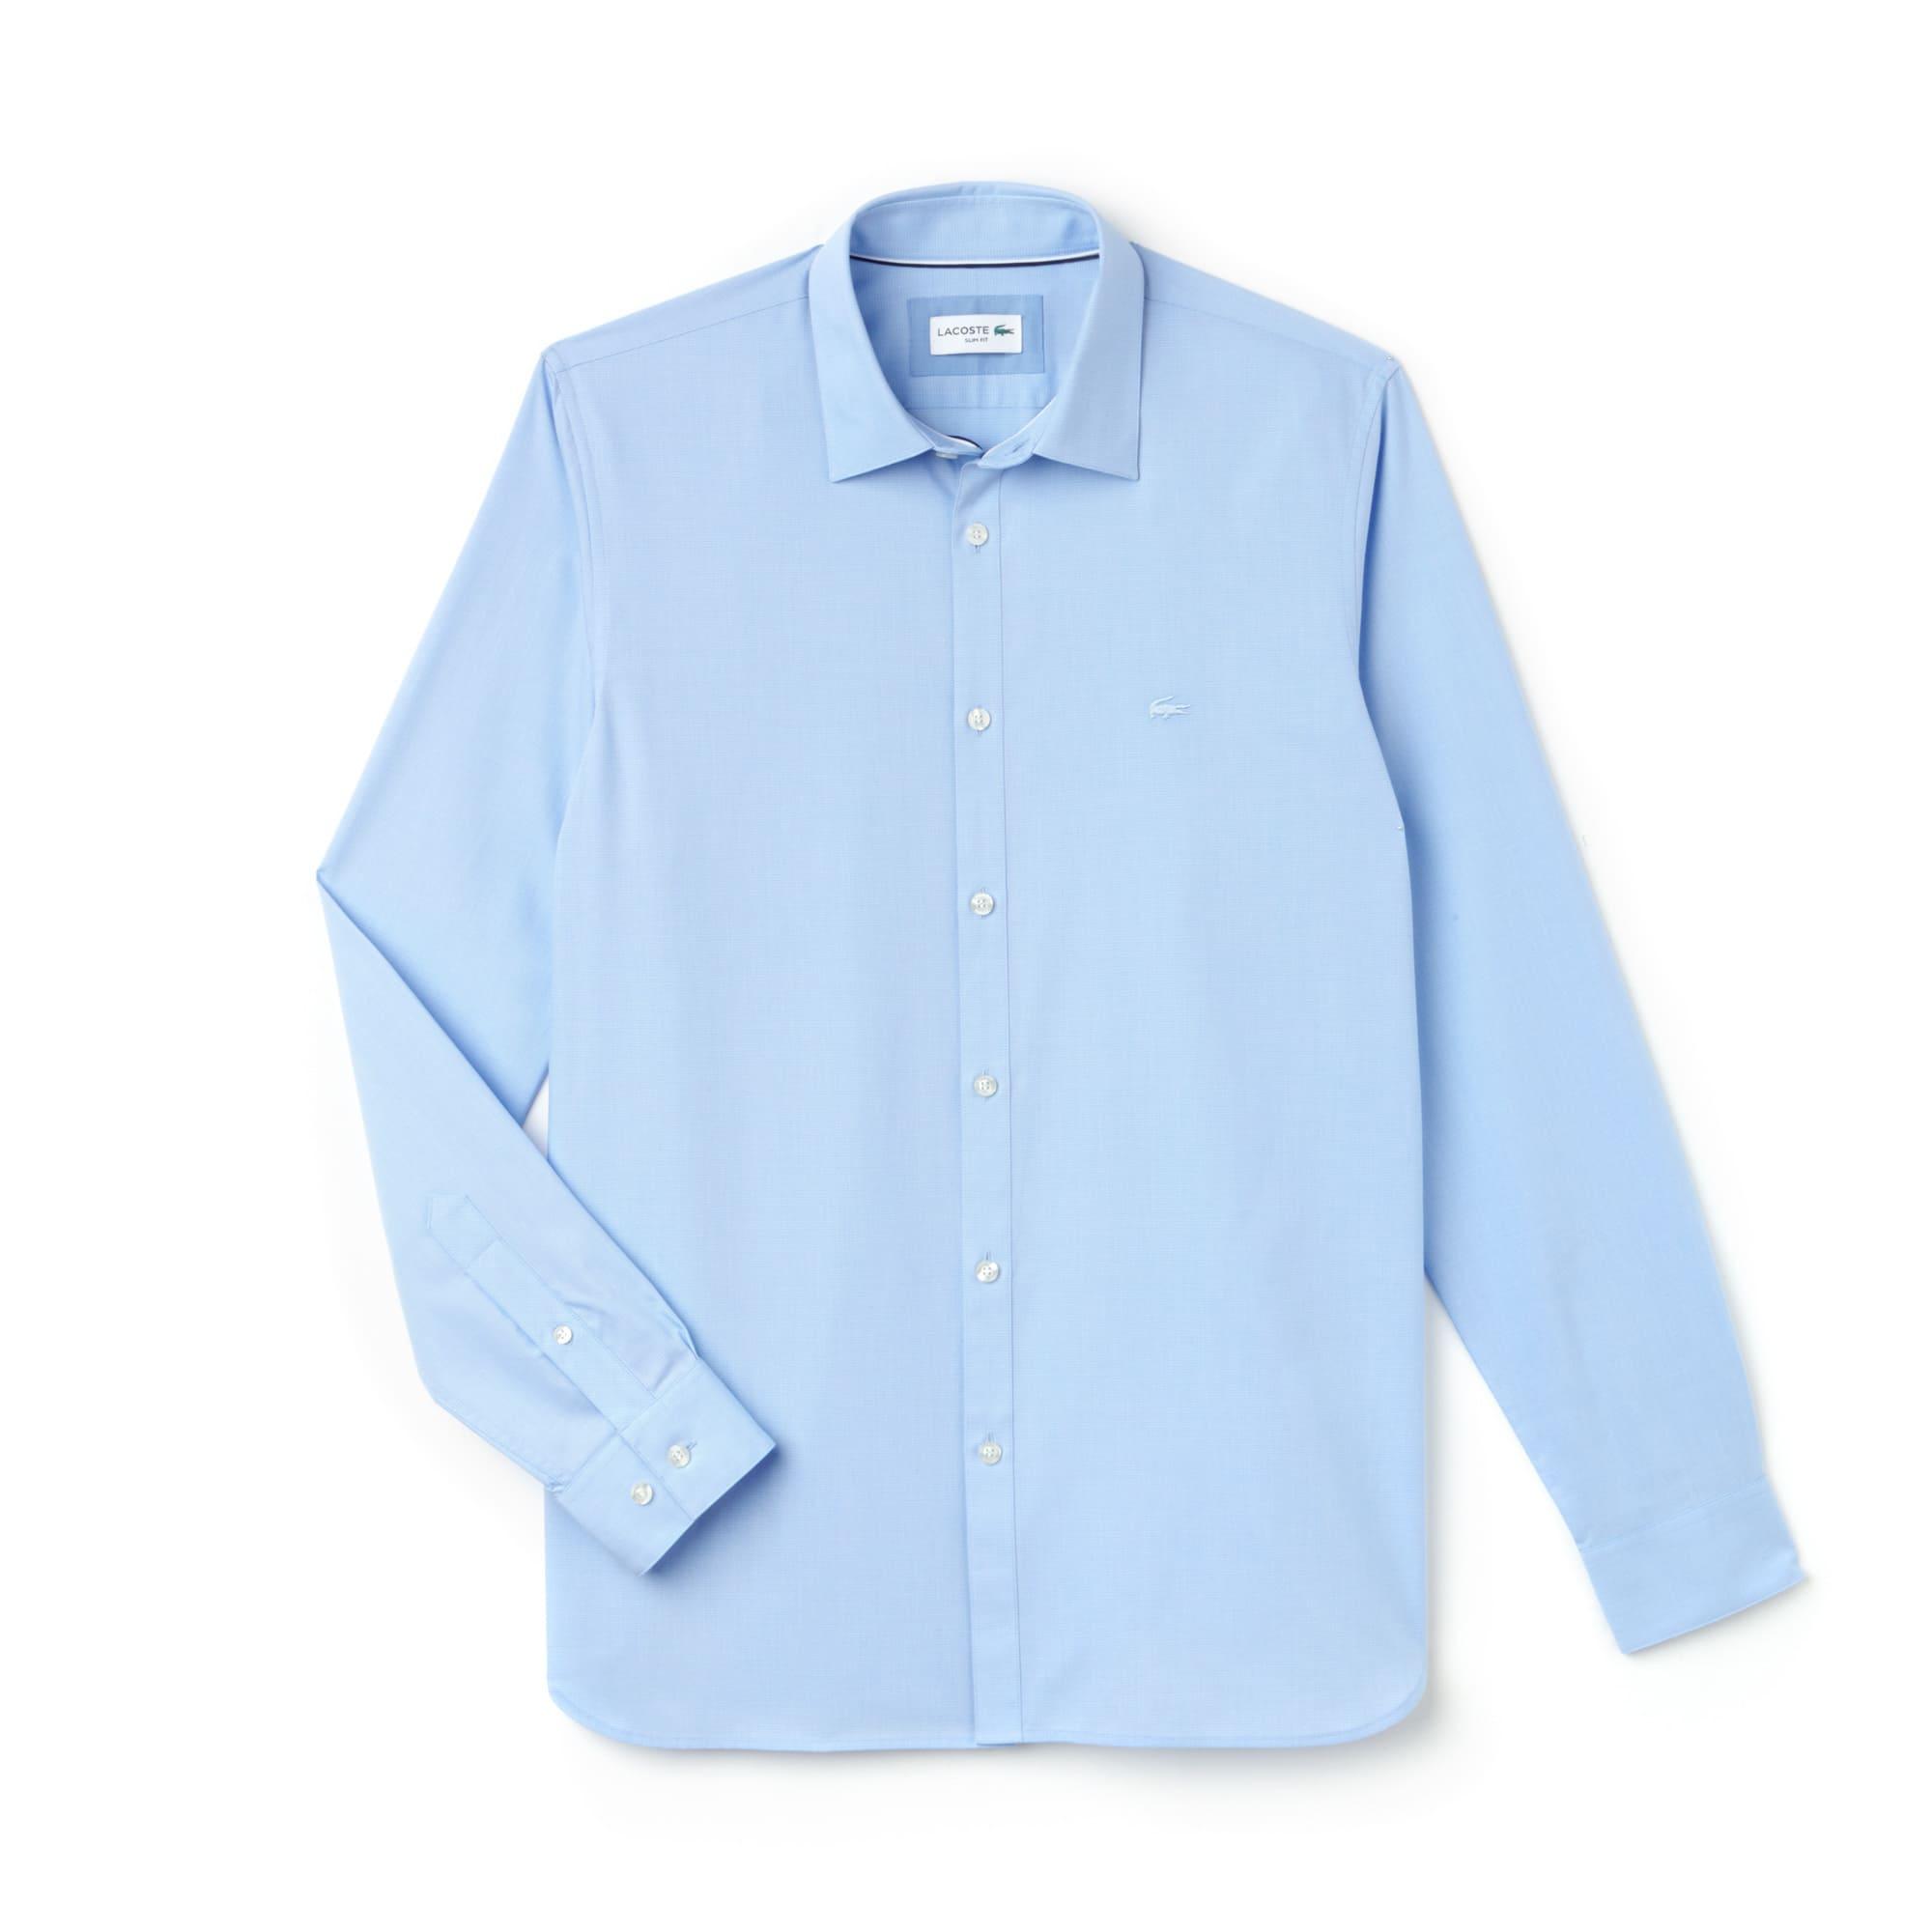 Men's Slim Fit Striped Jacquard Poplin Shirt